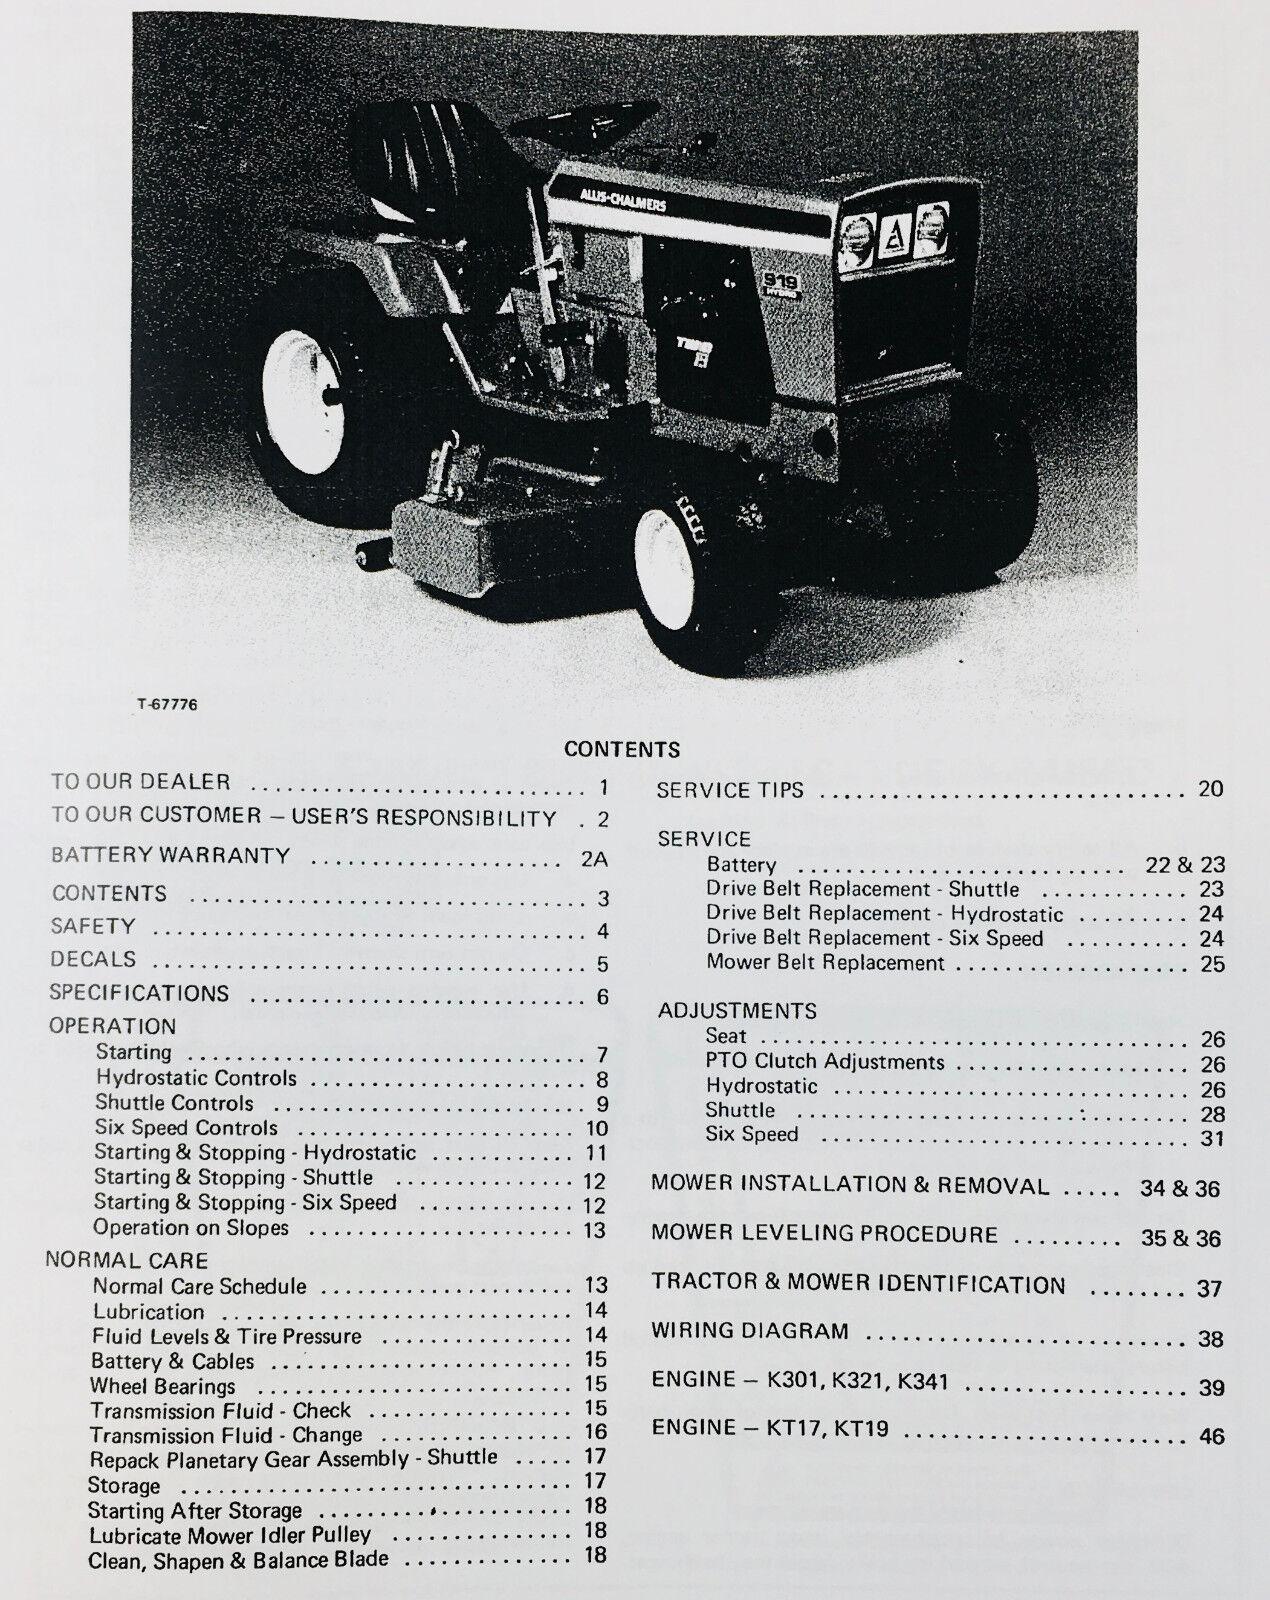 deutz 914 wiring diagram cat5 wall socket uk allis chalmers 912h 916h 917h lawn garden tractor